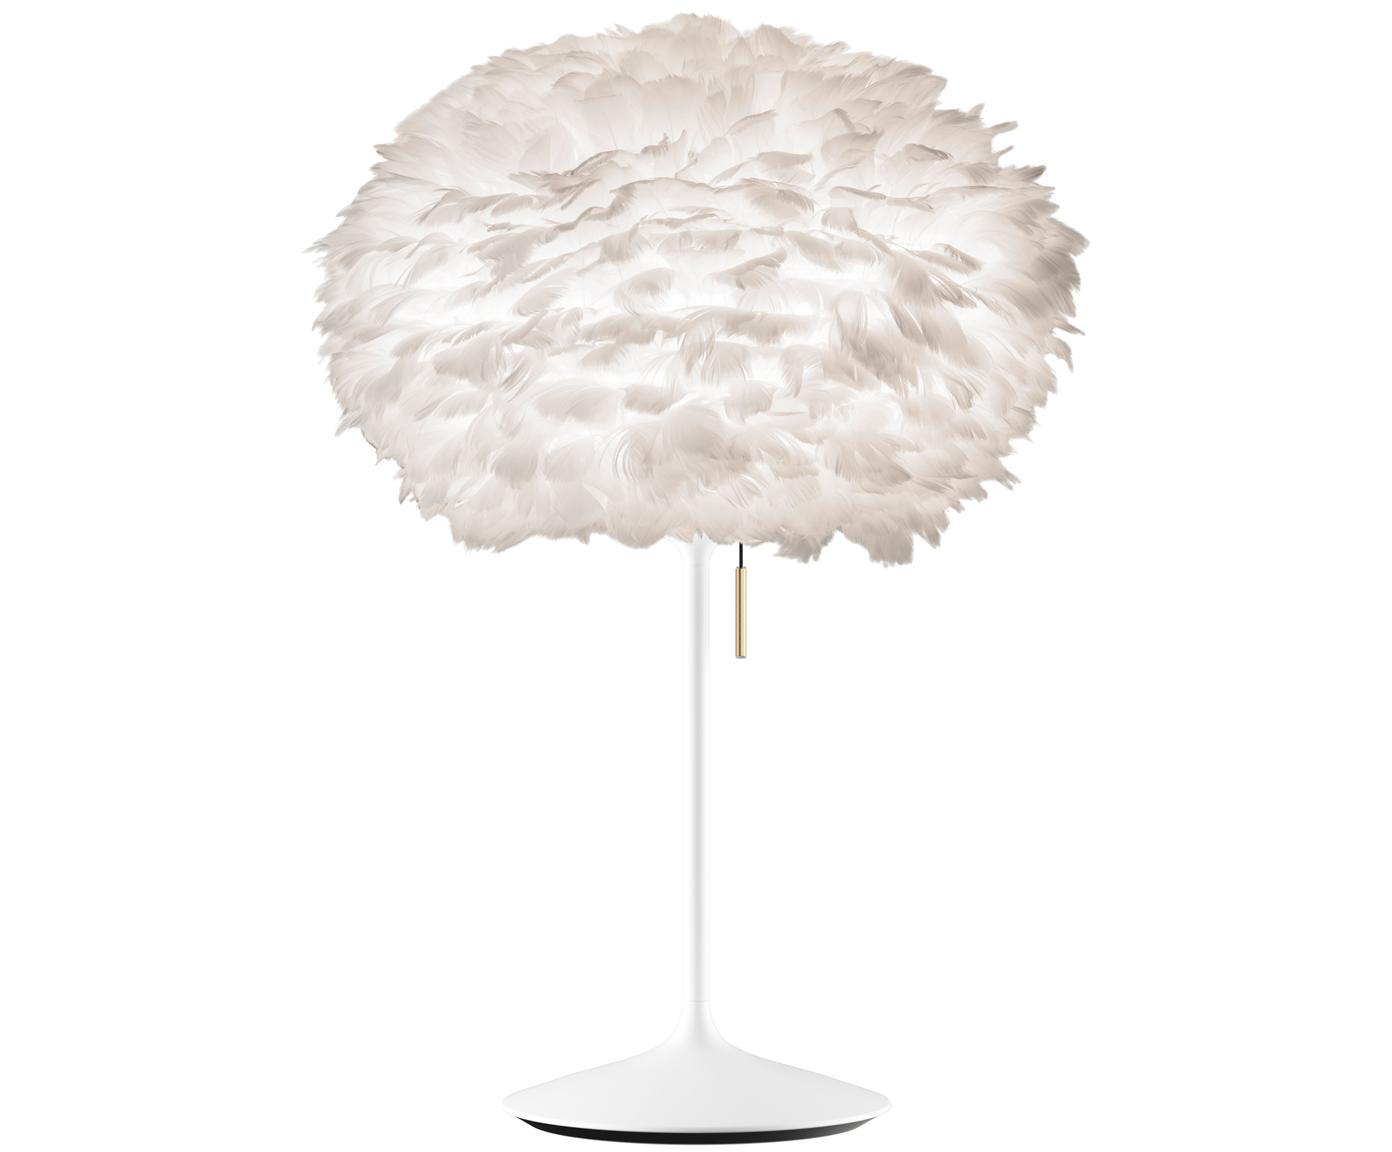 Grote tafellamp Eos Champagne, Lampenkap: polypropyleen, polycarbon, Lampvoet: gelakt aluminium, Frame: staal, Wit, Ø 45 x H 72 cm